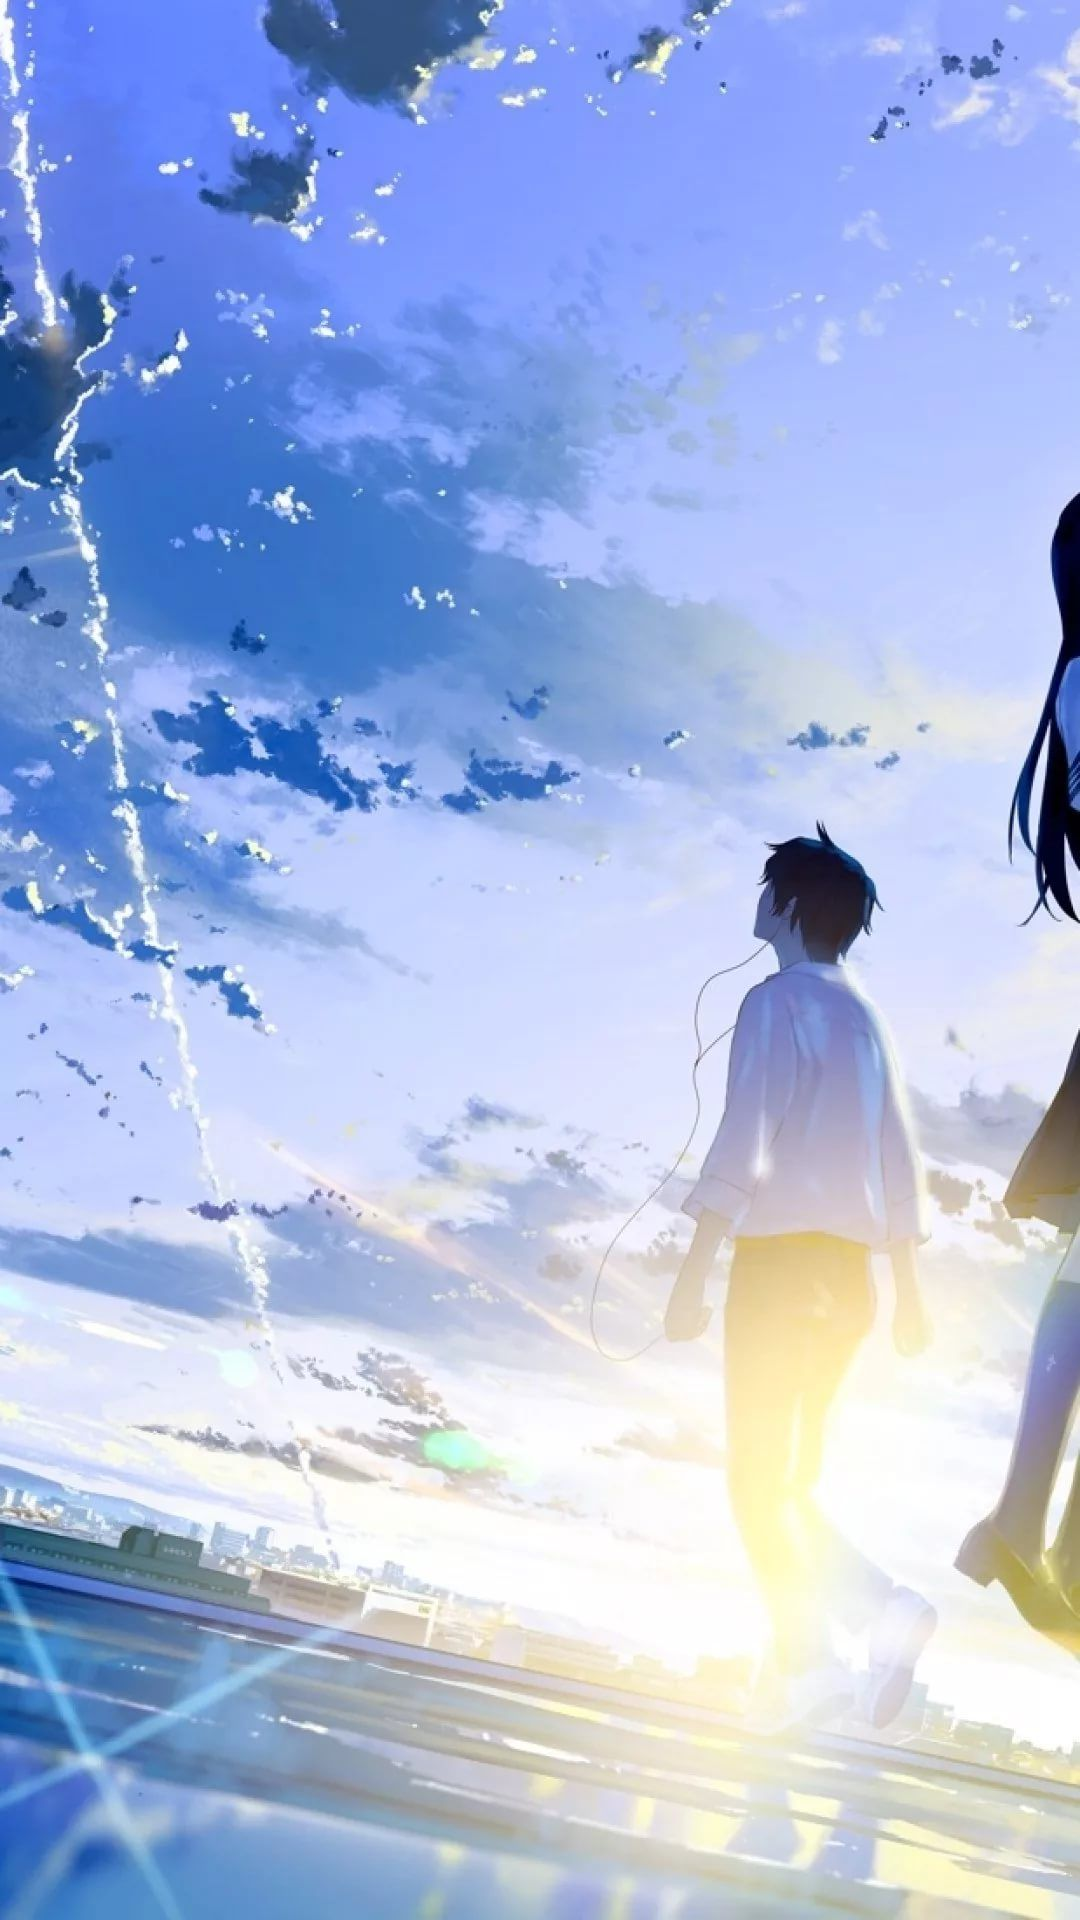 Sad Anime Apple wallpaper HD